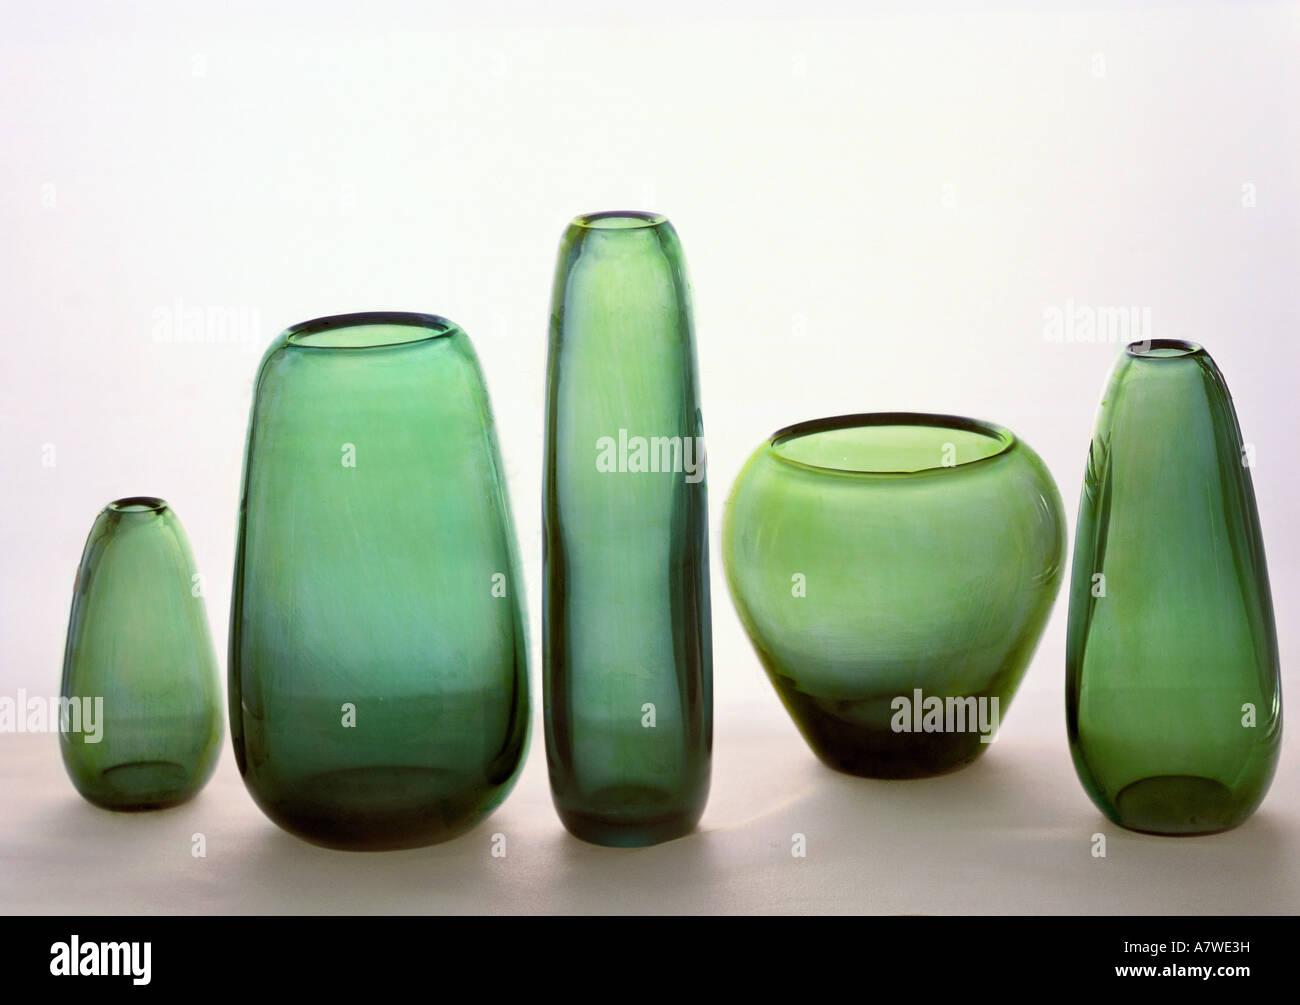 Fine arts glass vases from green glass design by wilhelm fine arts glass vases from green glass design by wilhelm wagenfeld 1900 1990 germany circa 1955 die neue sammlung mun reviewsmspy